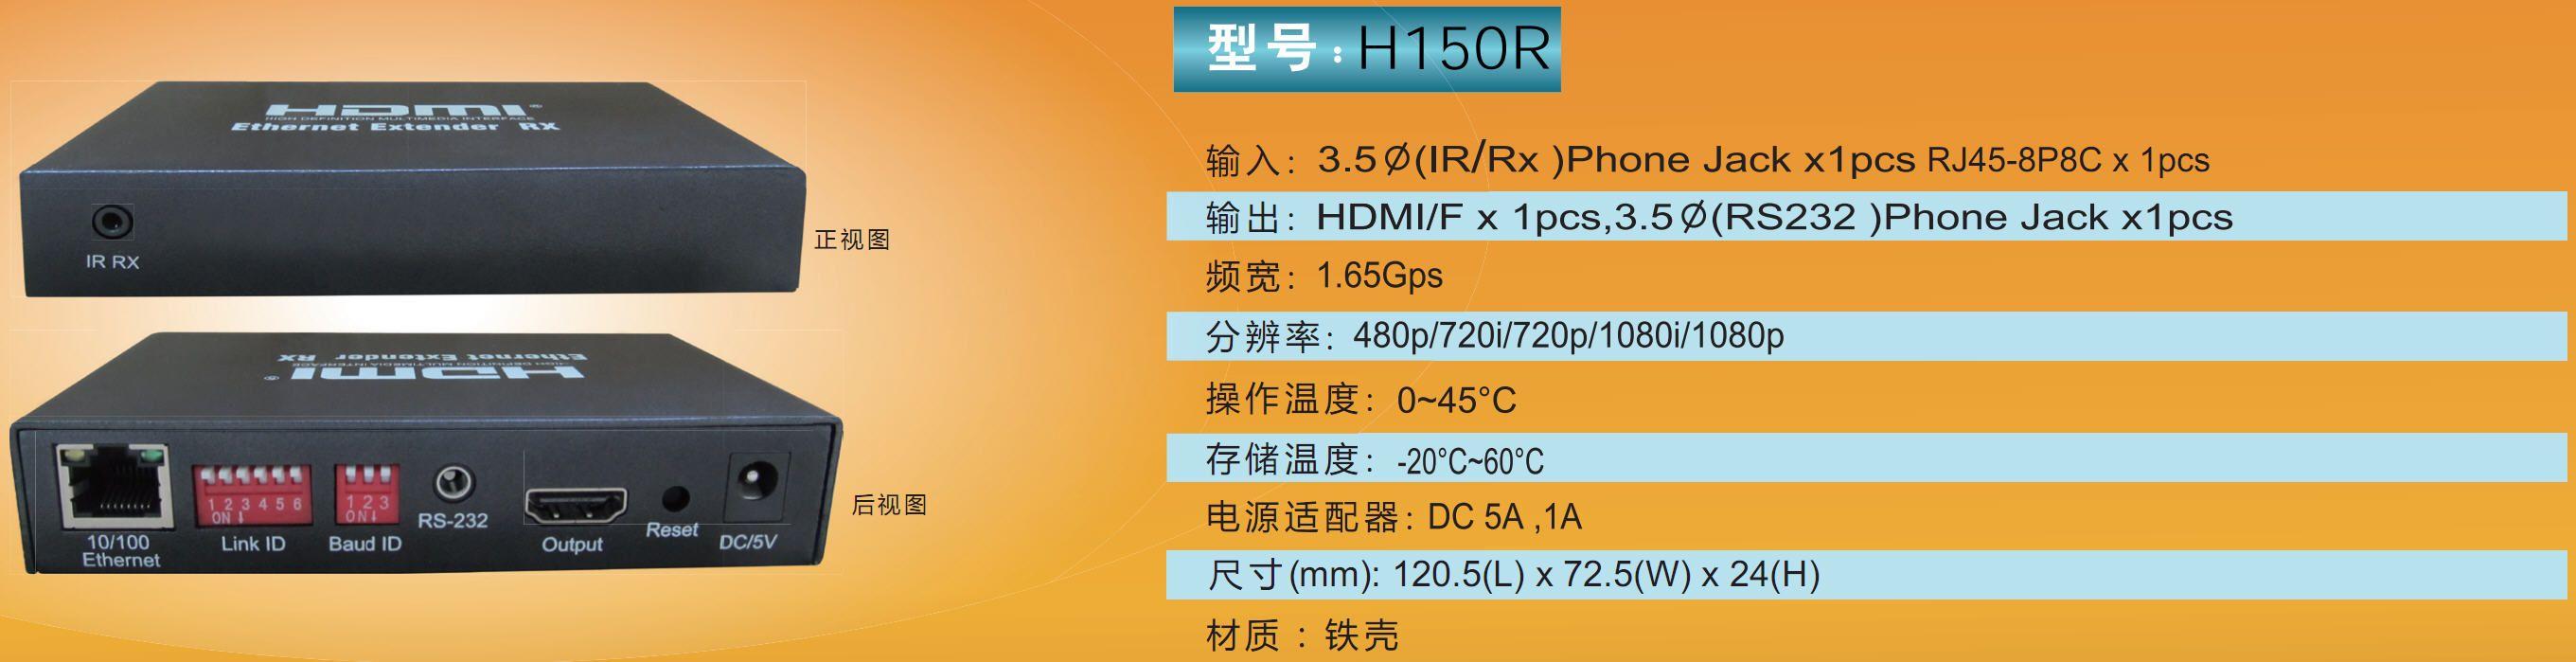 pcidv.com/双绞线传输200米hdmi延长器H150R接收端参数